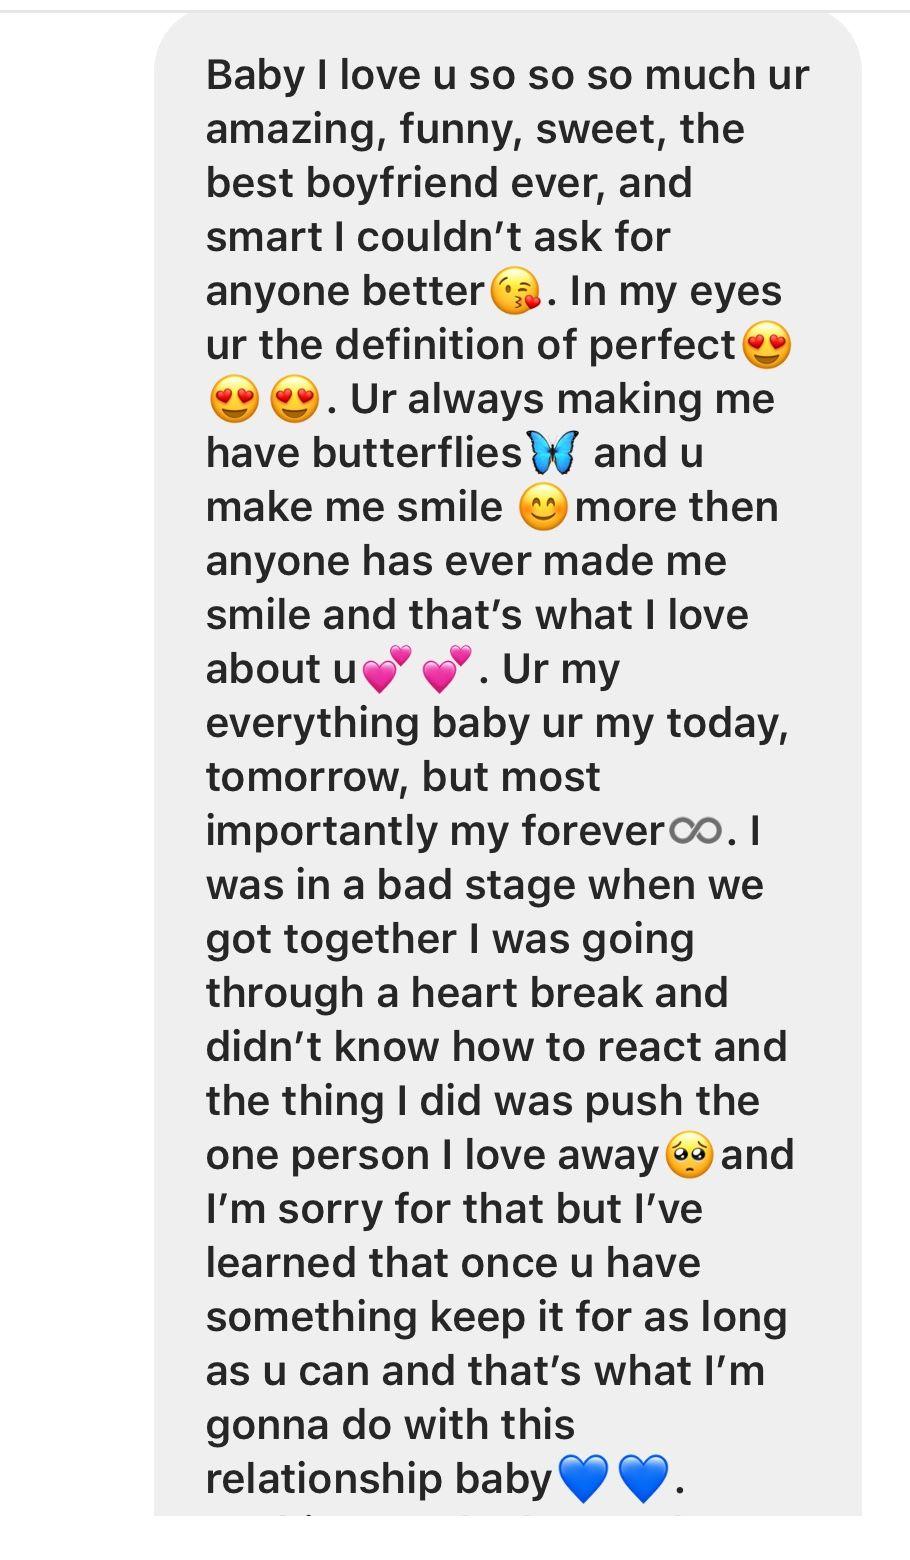 25 Cute Paragraphs to Send to Your Boyfriend | herinterest.com